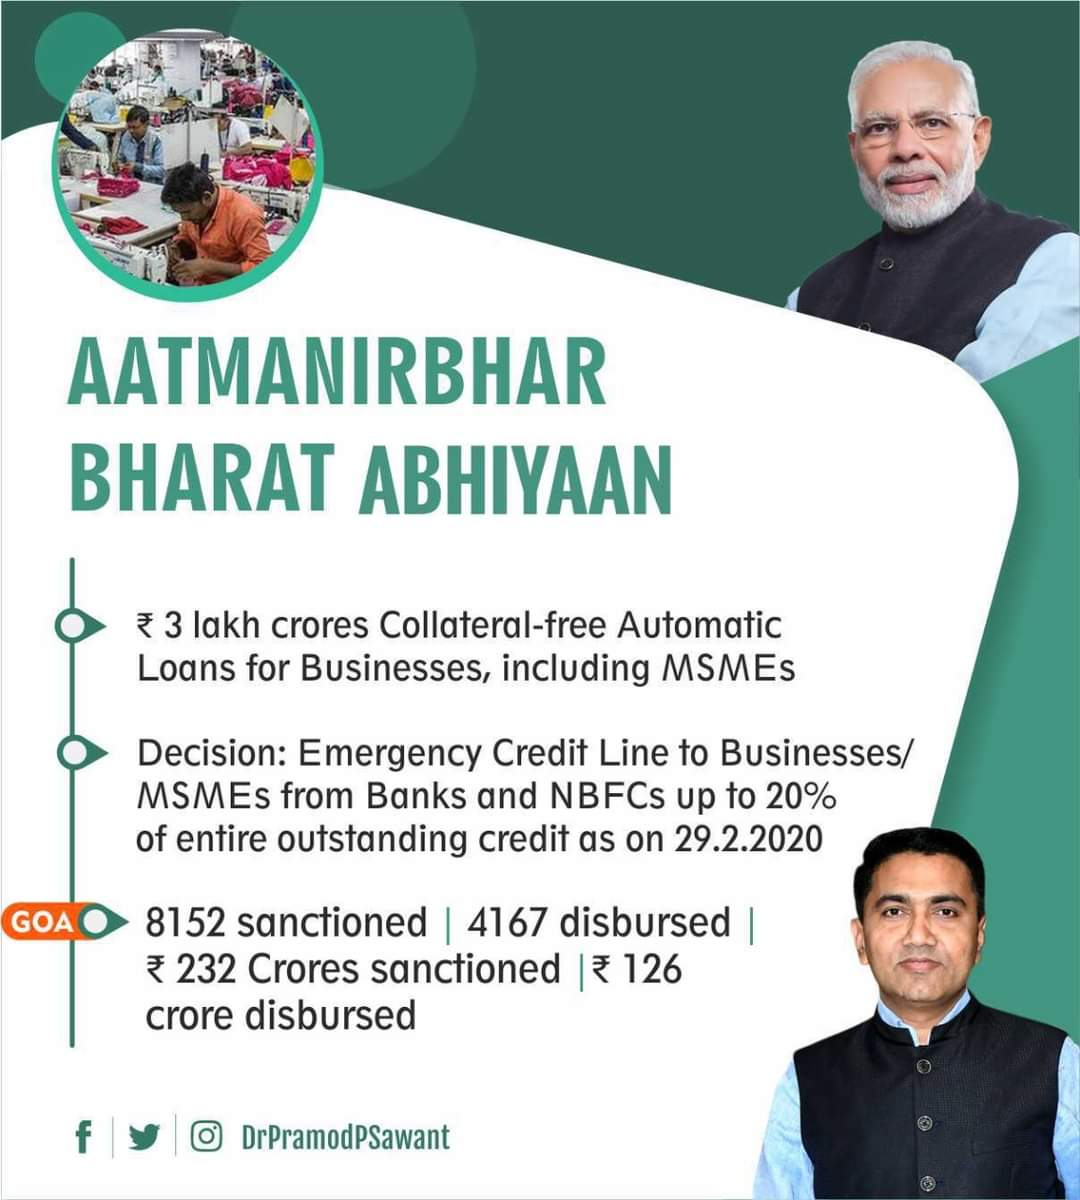 #MSME sector has been the key focus area under #AatmaNirbharBharatAbhiyaan. https://t.co/wF5DHAQnNh